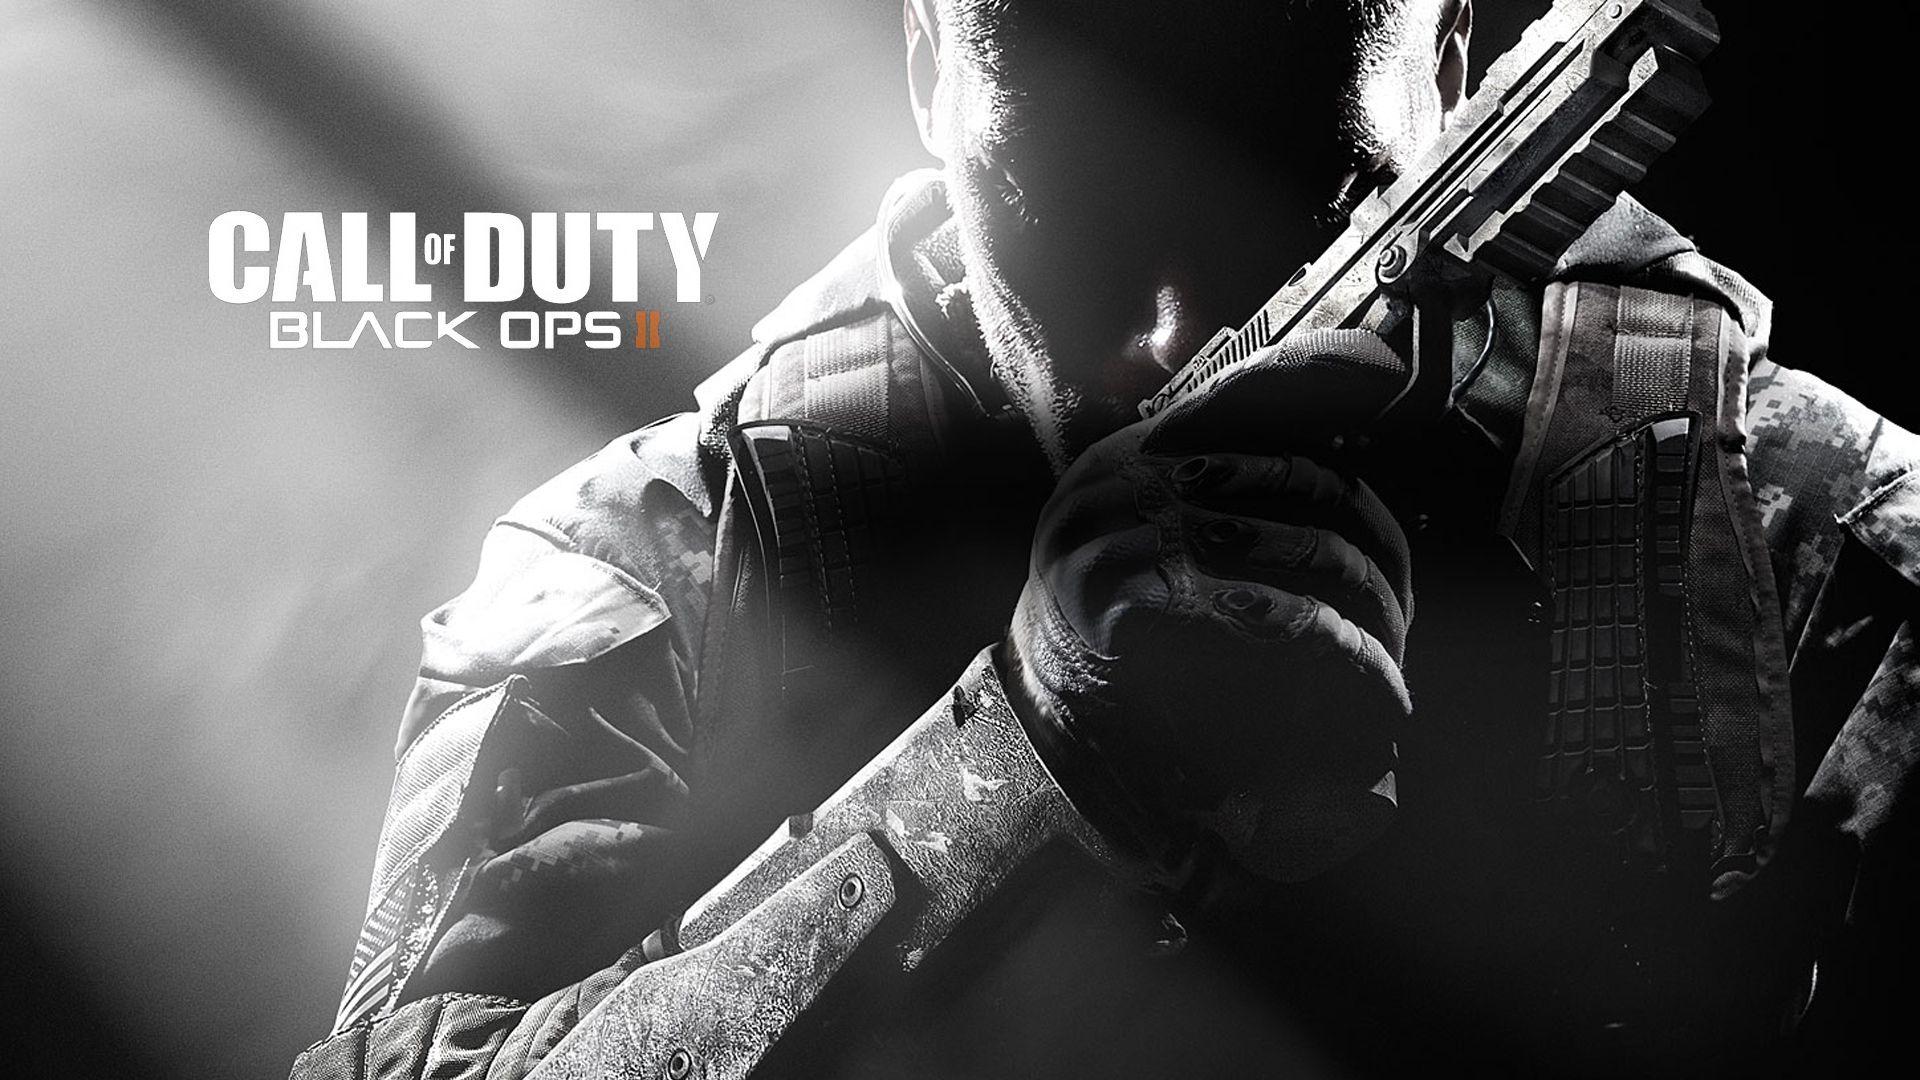 Call Of Duty Wallpaper 1920 1080 Hd Wallpaper Call Of Duty Black Call Duty Black Ops Call Of Duty